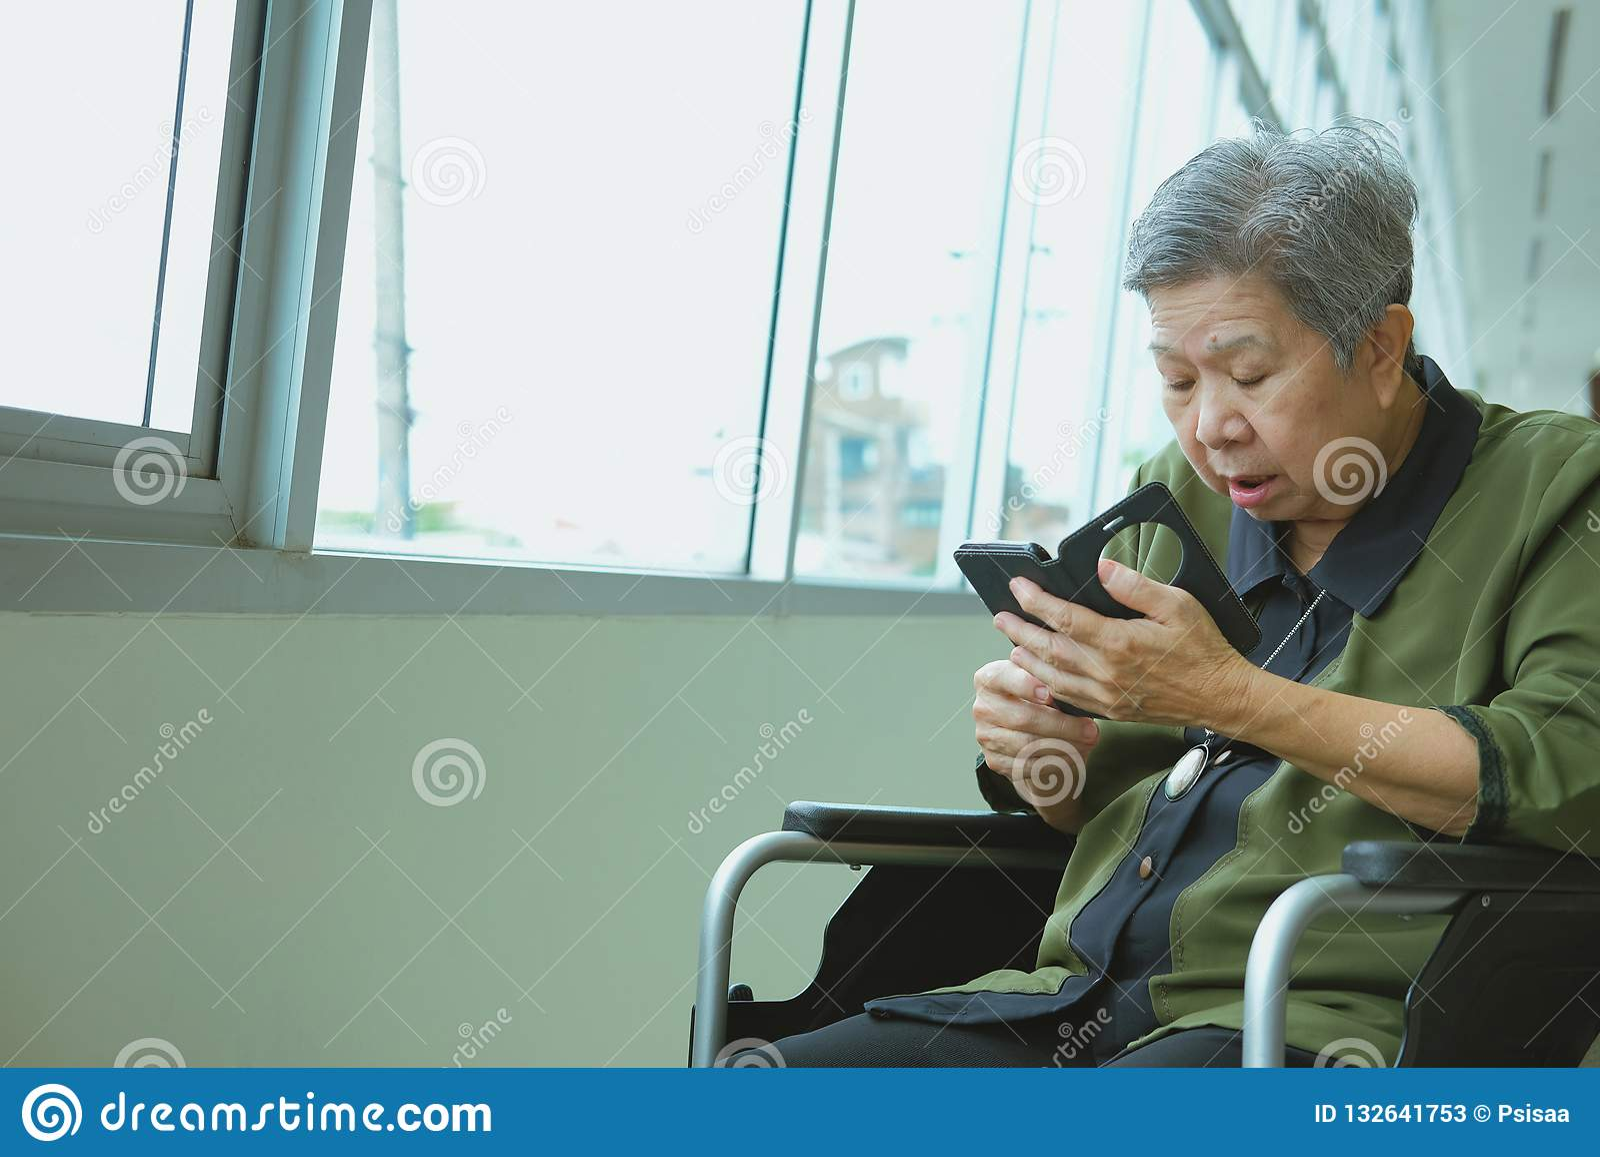 elder woman in wheelchair holding mobile phone surprised shocked